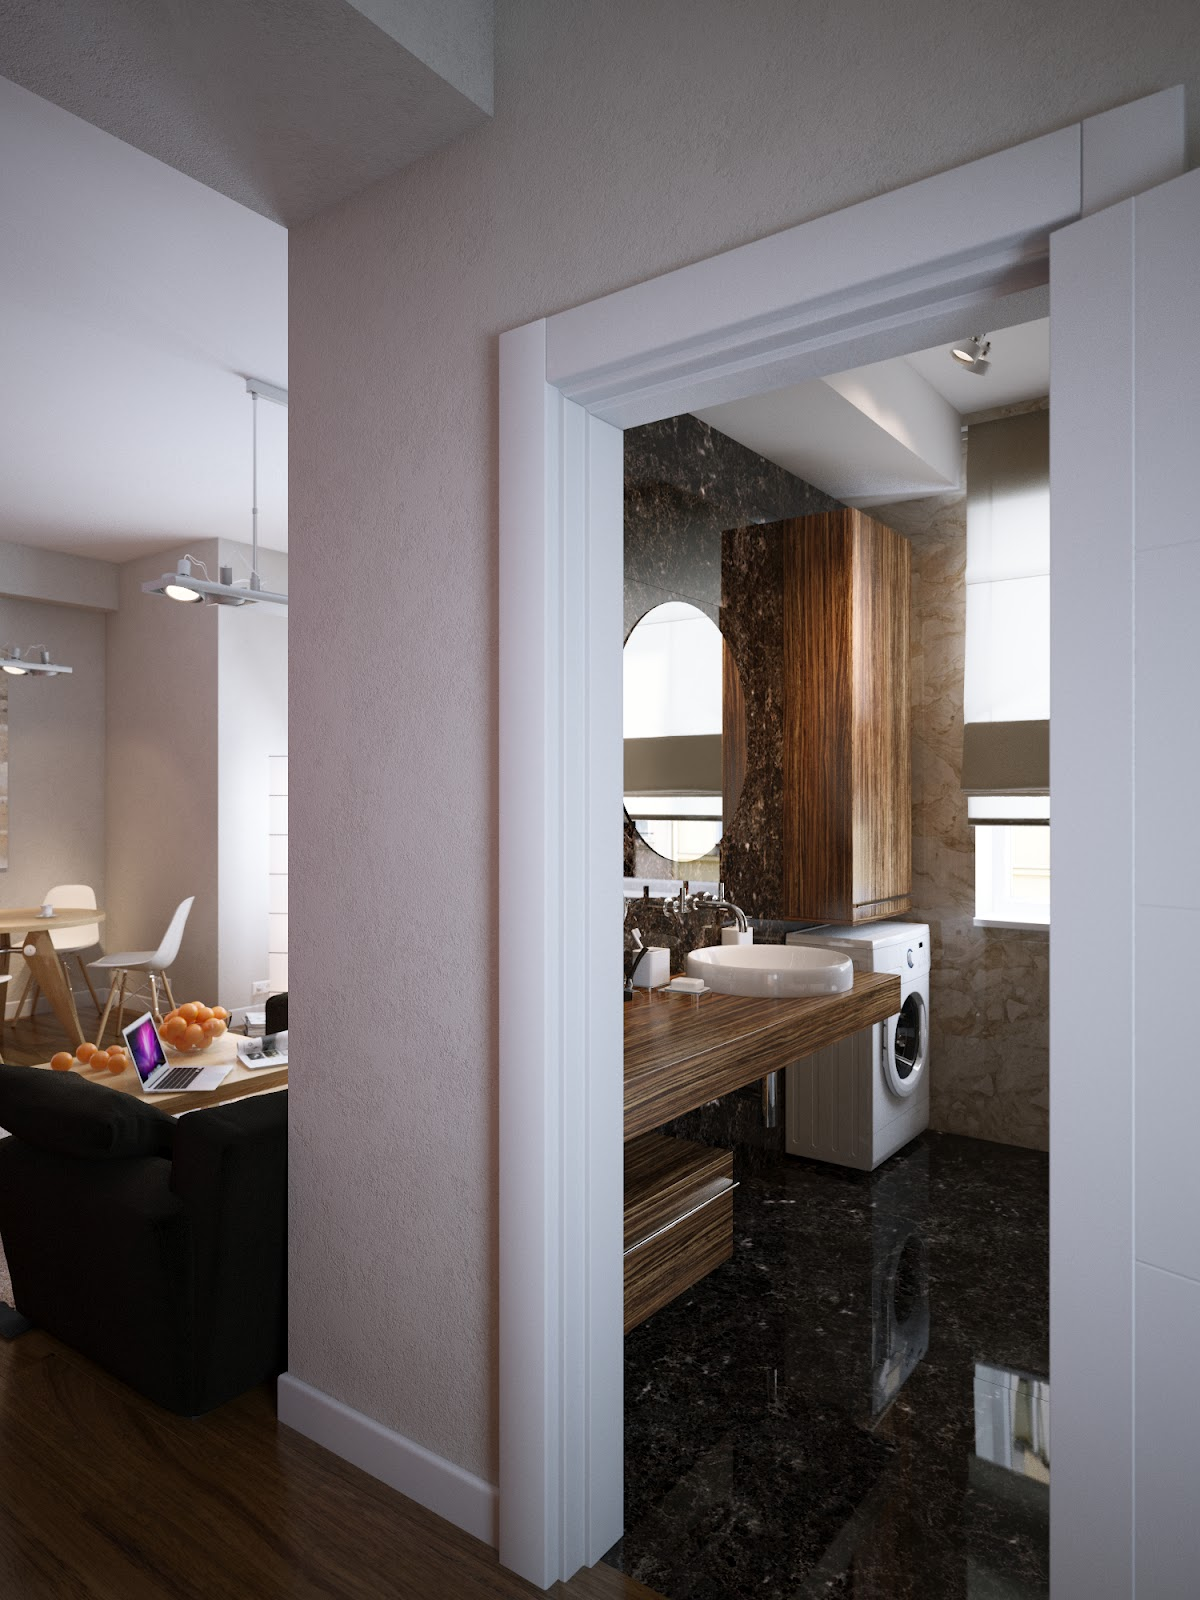 Walnut Vanity Unit Brown Marble Bathroom Floor Interior Design Ideas